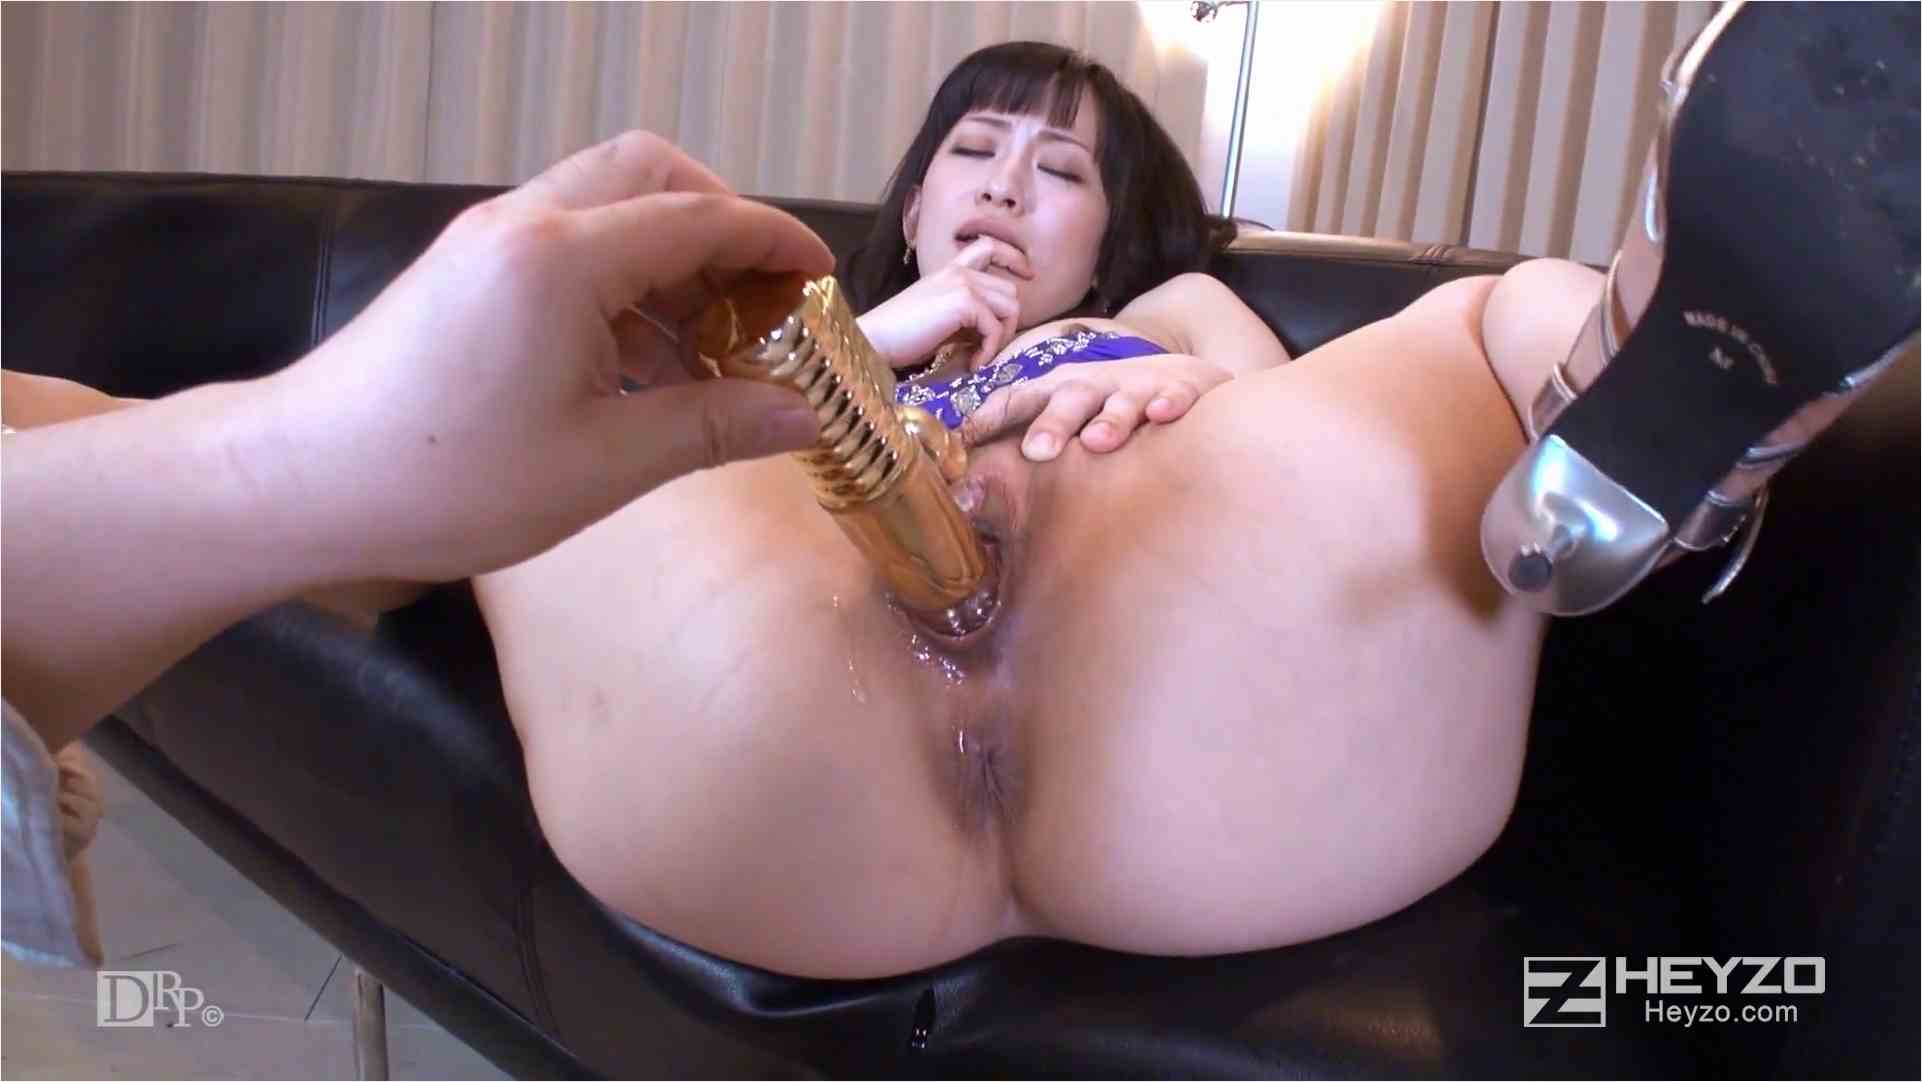 HEYZO-0512-淫誘する悩殺ドレスの女~紫と赤のセクシースパイラル~